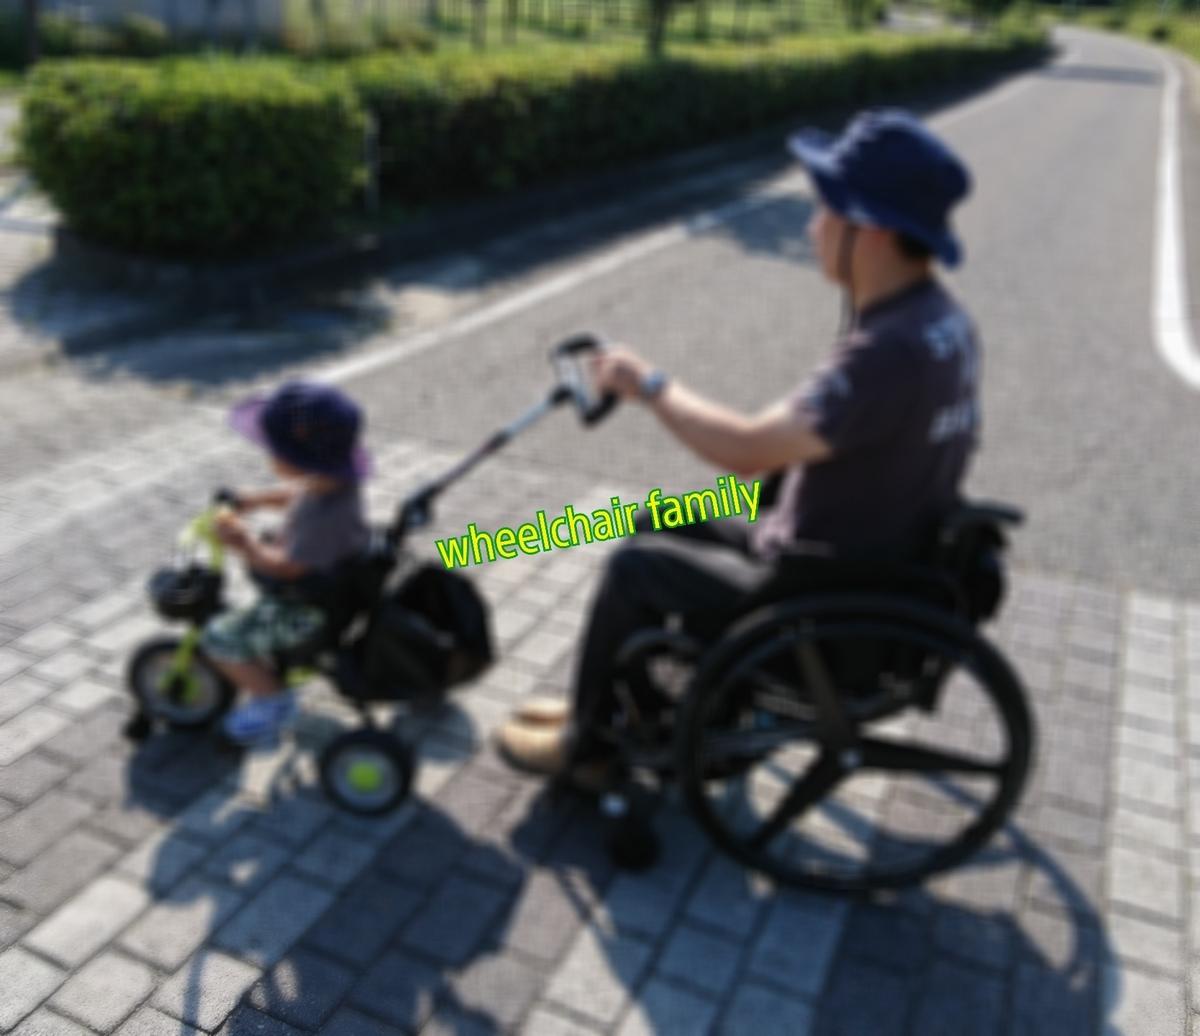 f:id:WheelchairFamily:20190627214352j:plain